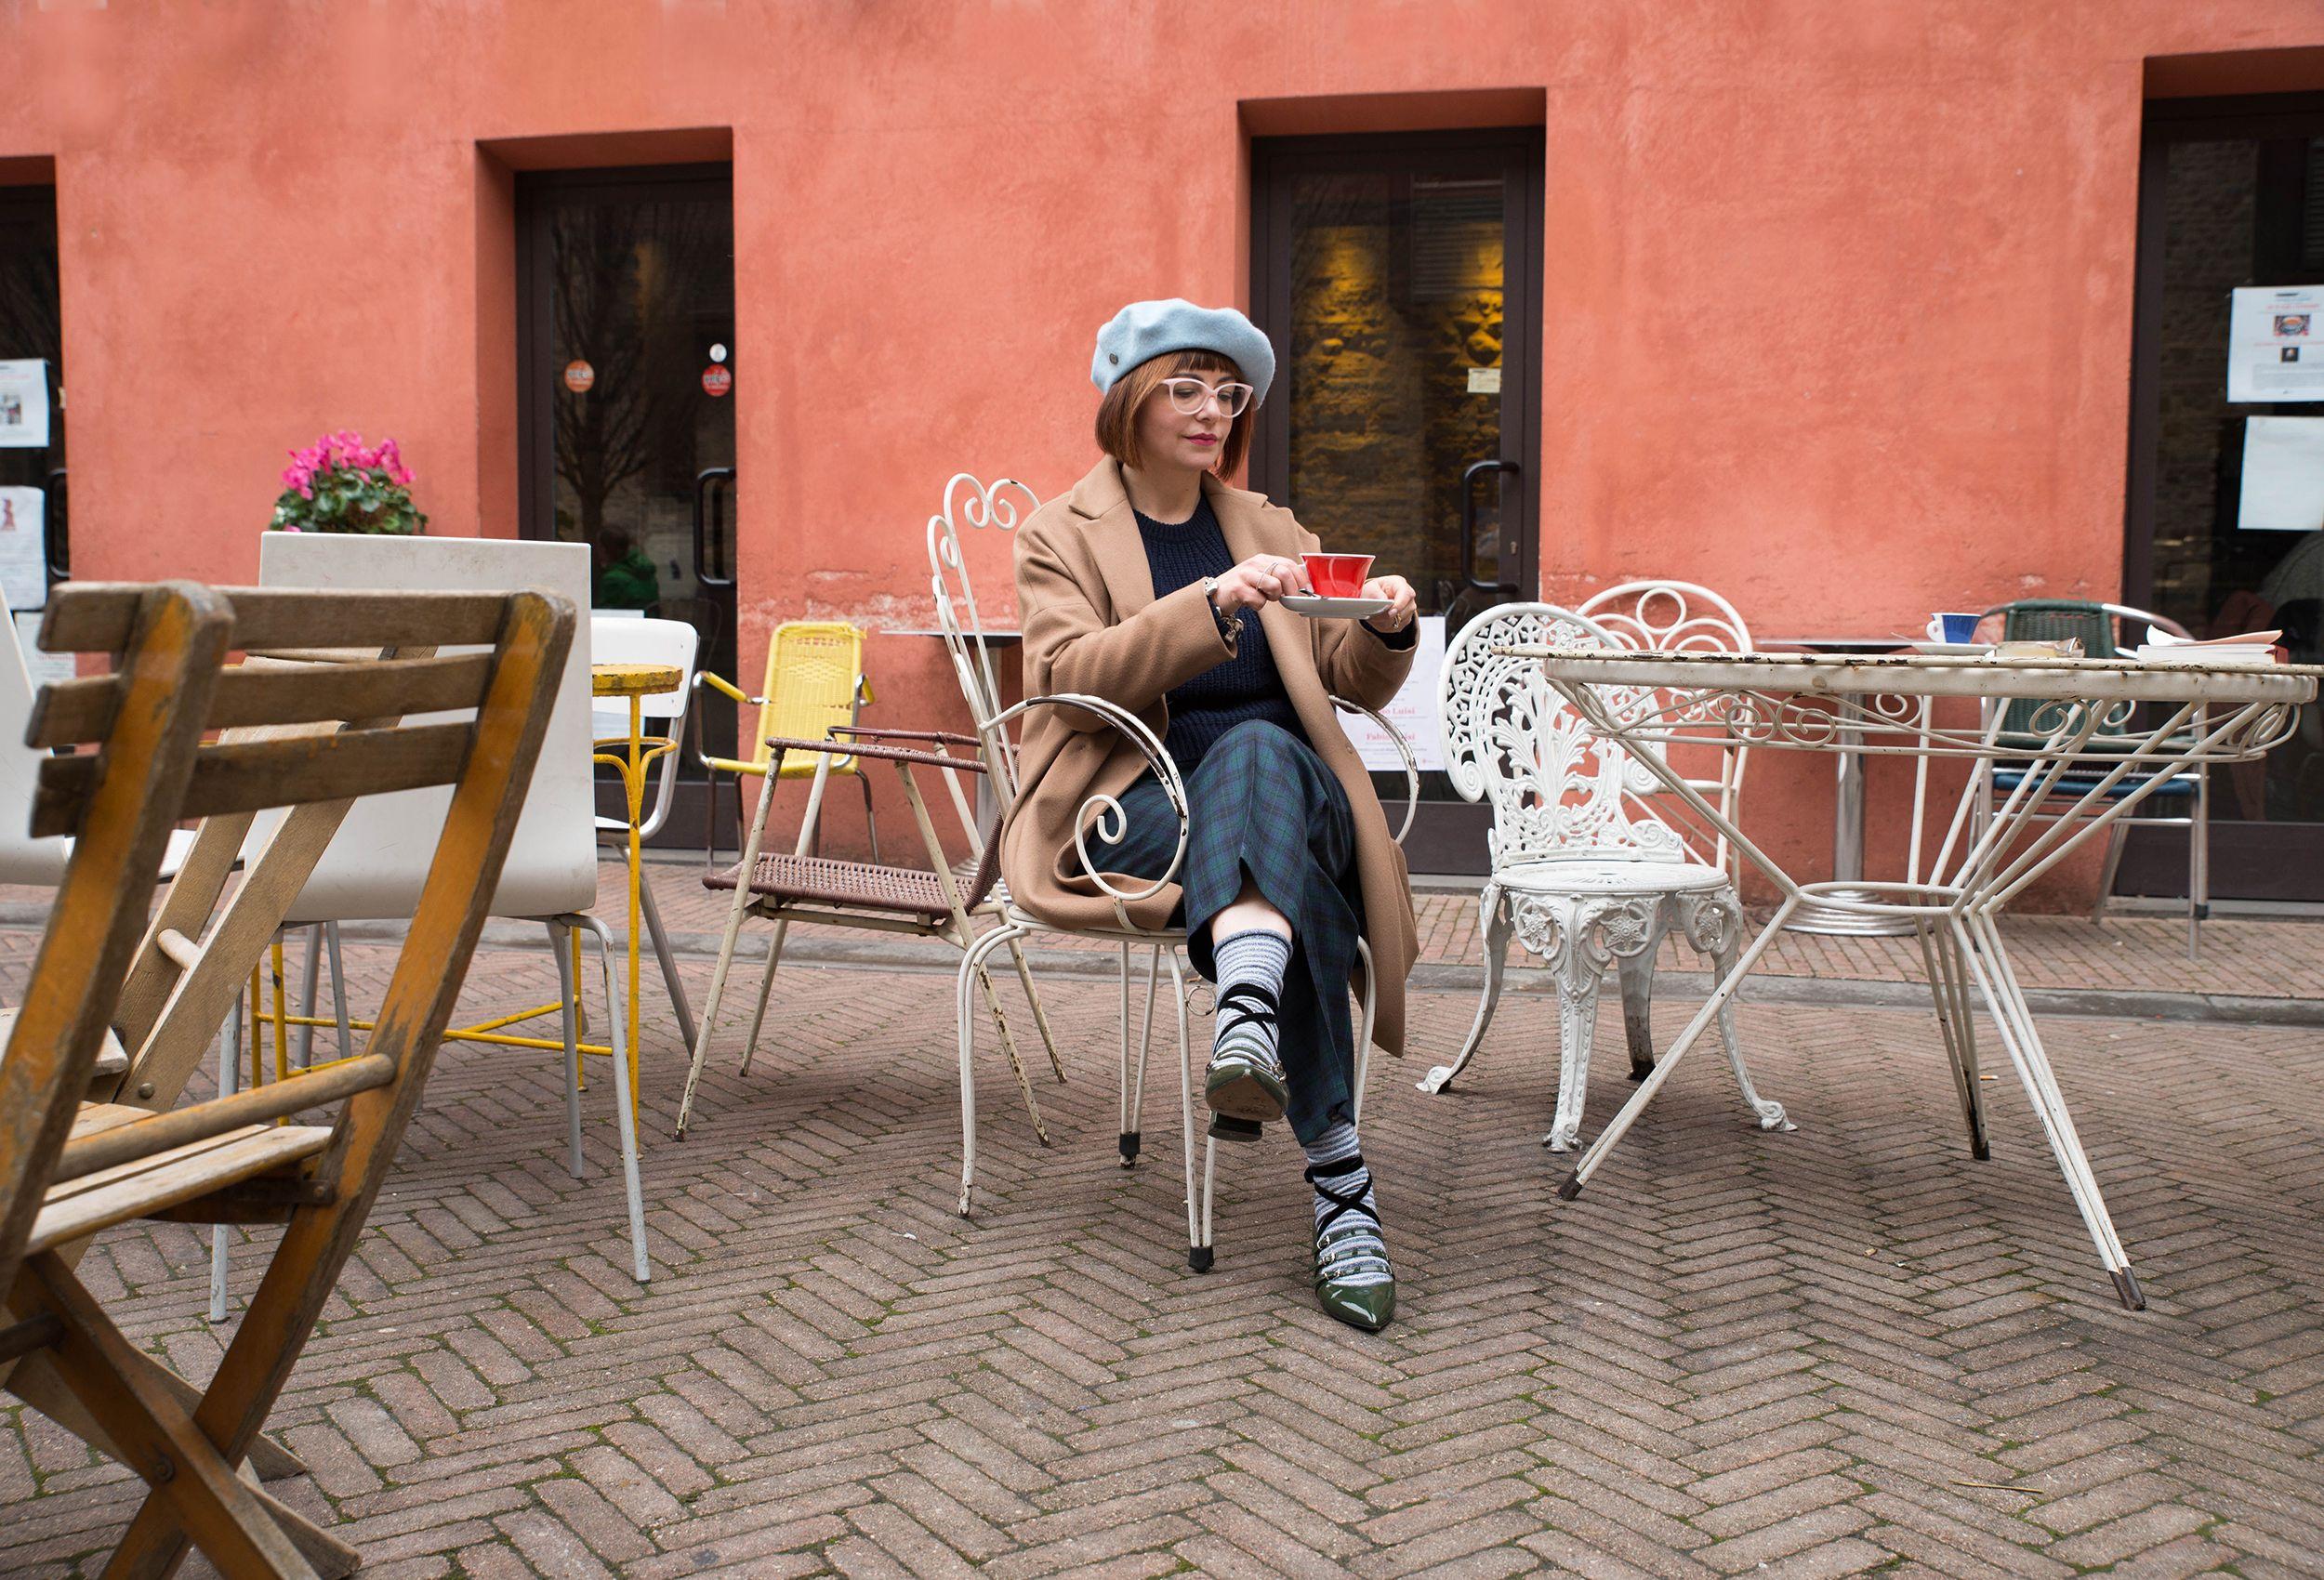 pantaloni a quadri calzini a righe ballerine a punta basco alla francese